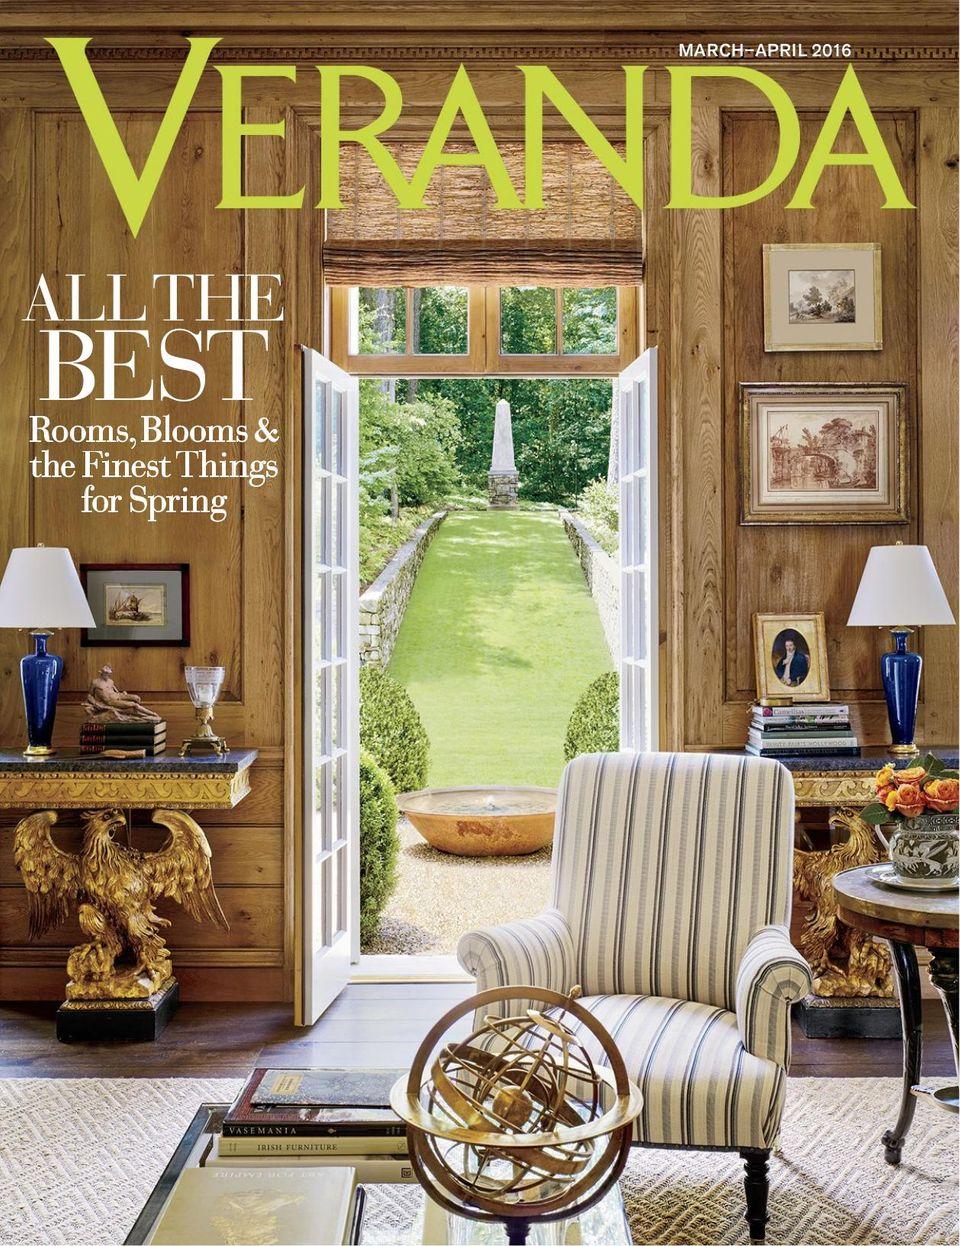 Get Your Digital Copy Of Veranda March April 2016 Issue